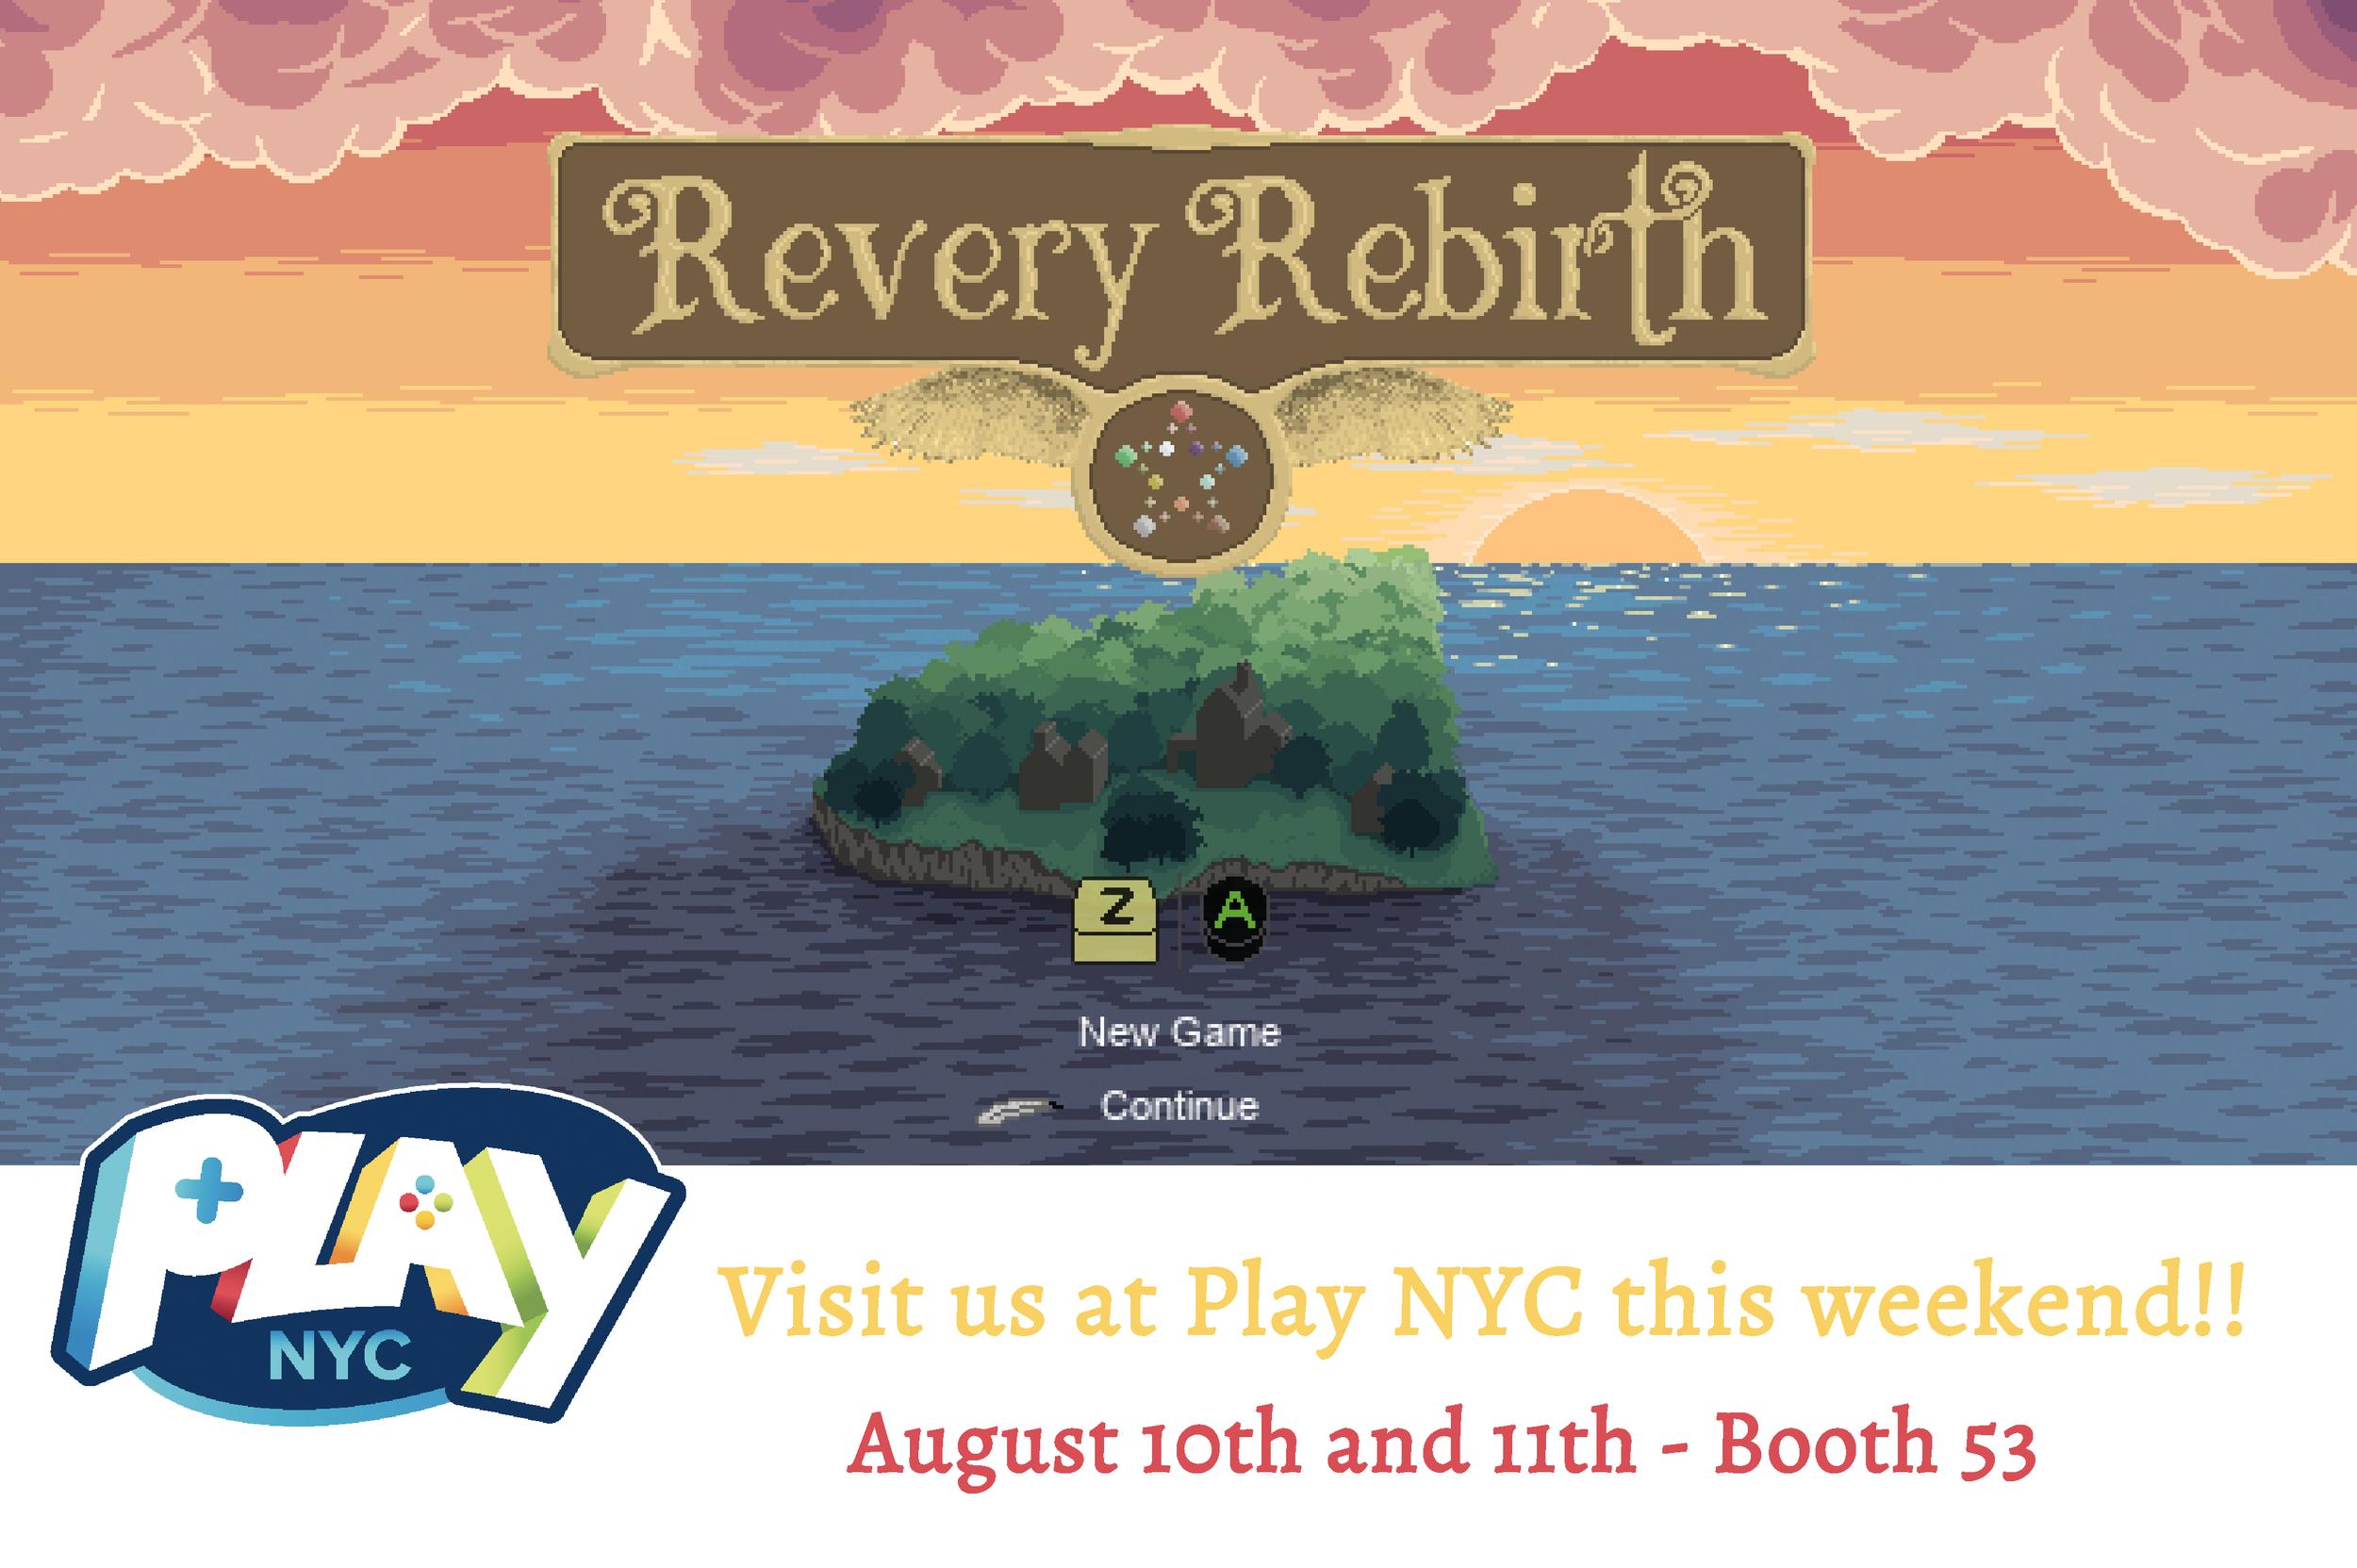 Revery Rebirth Play NYC